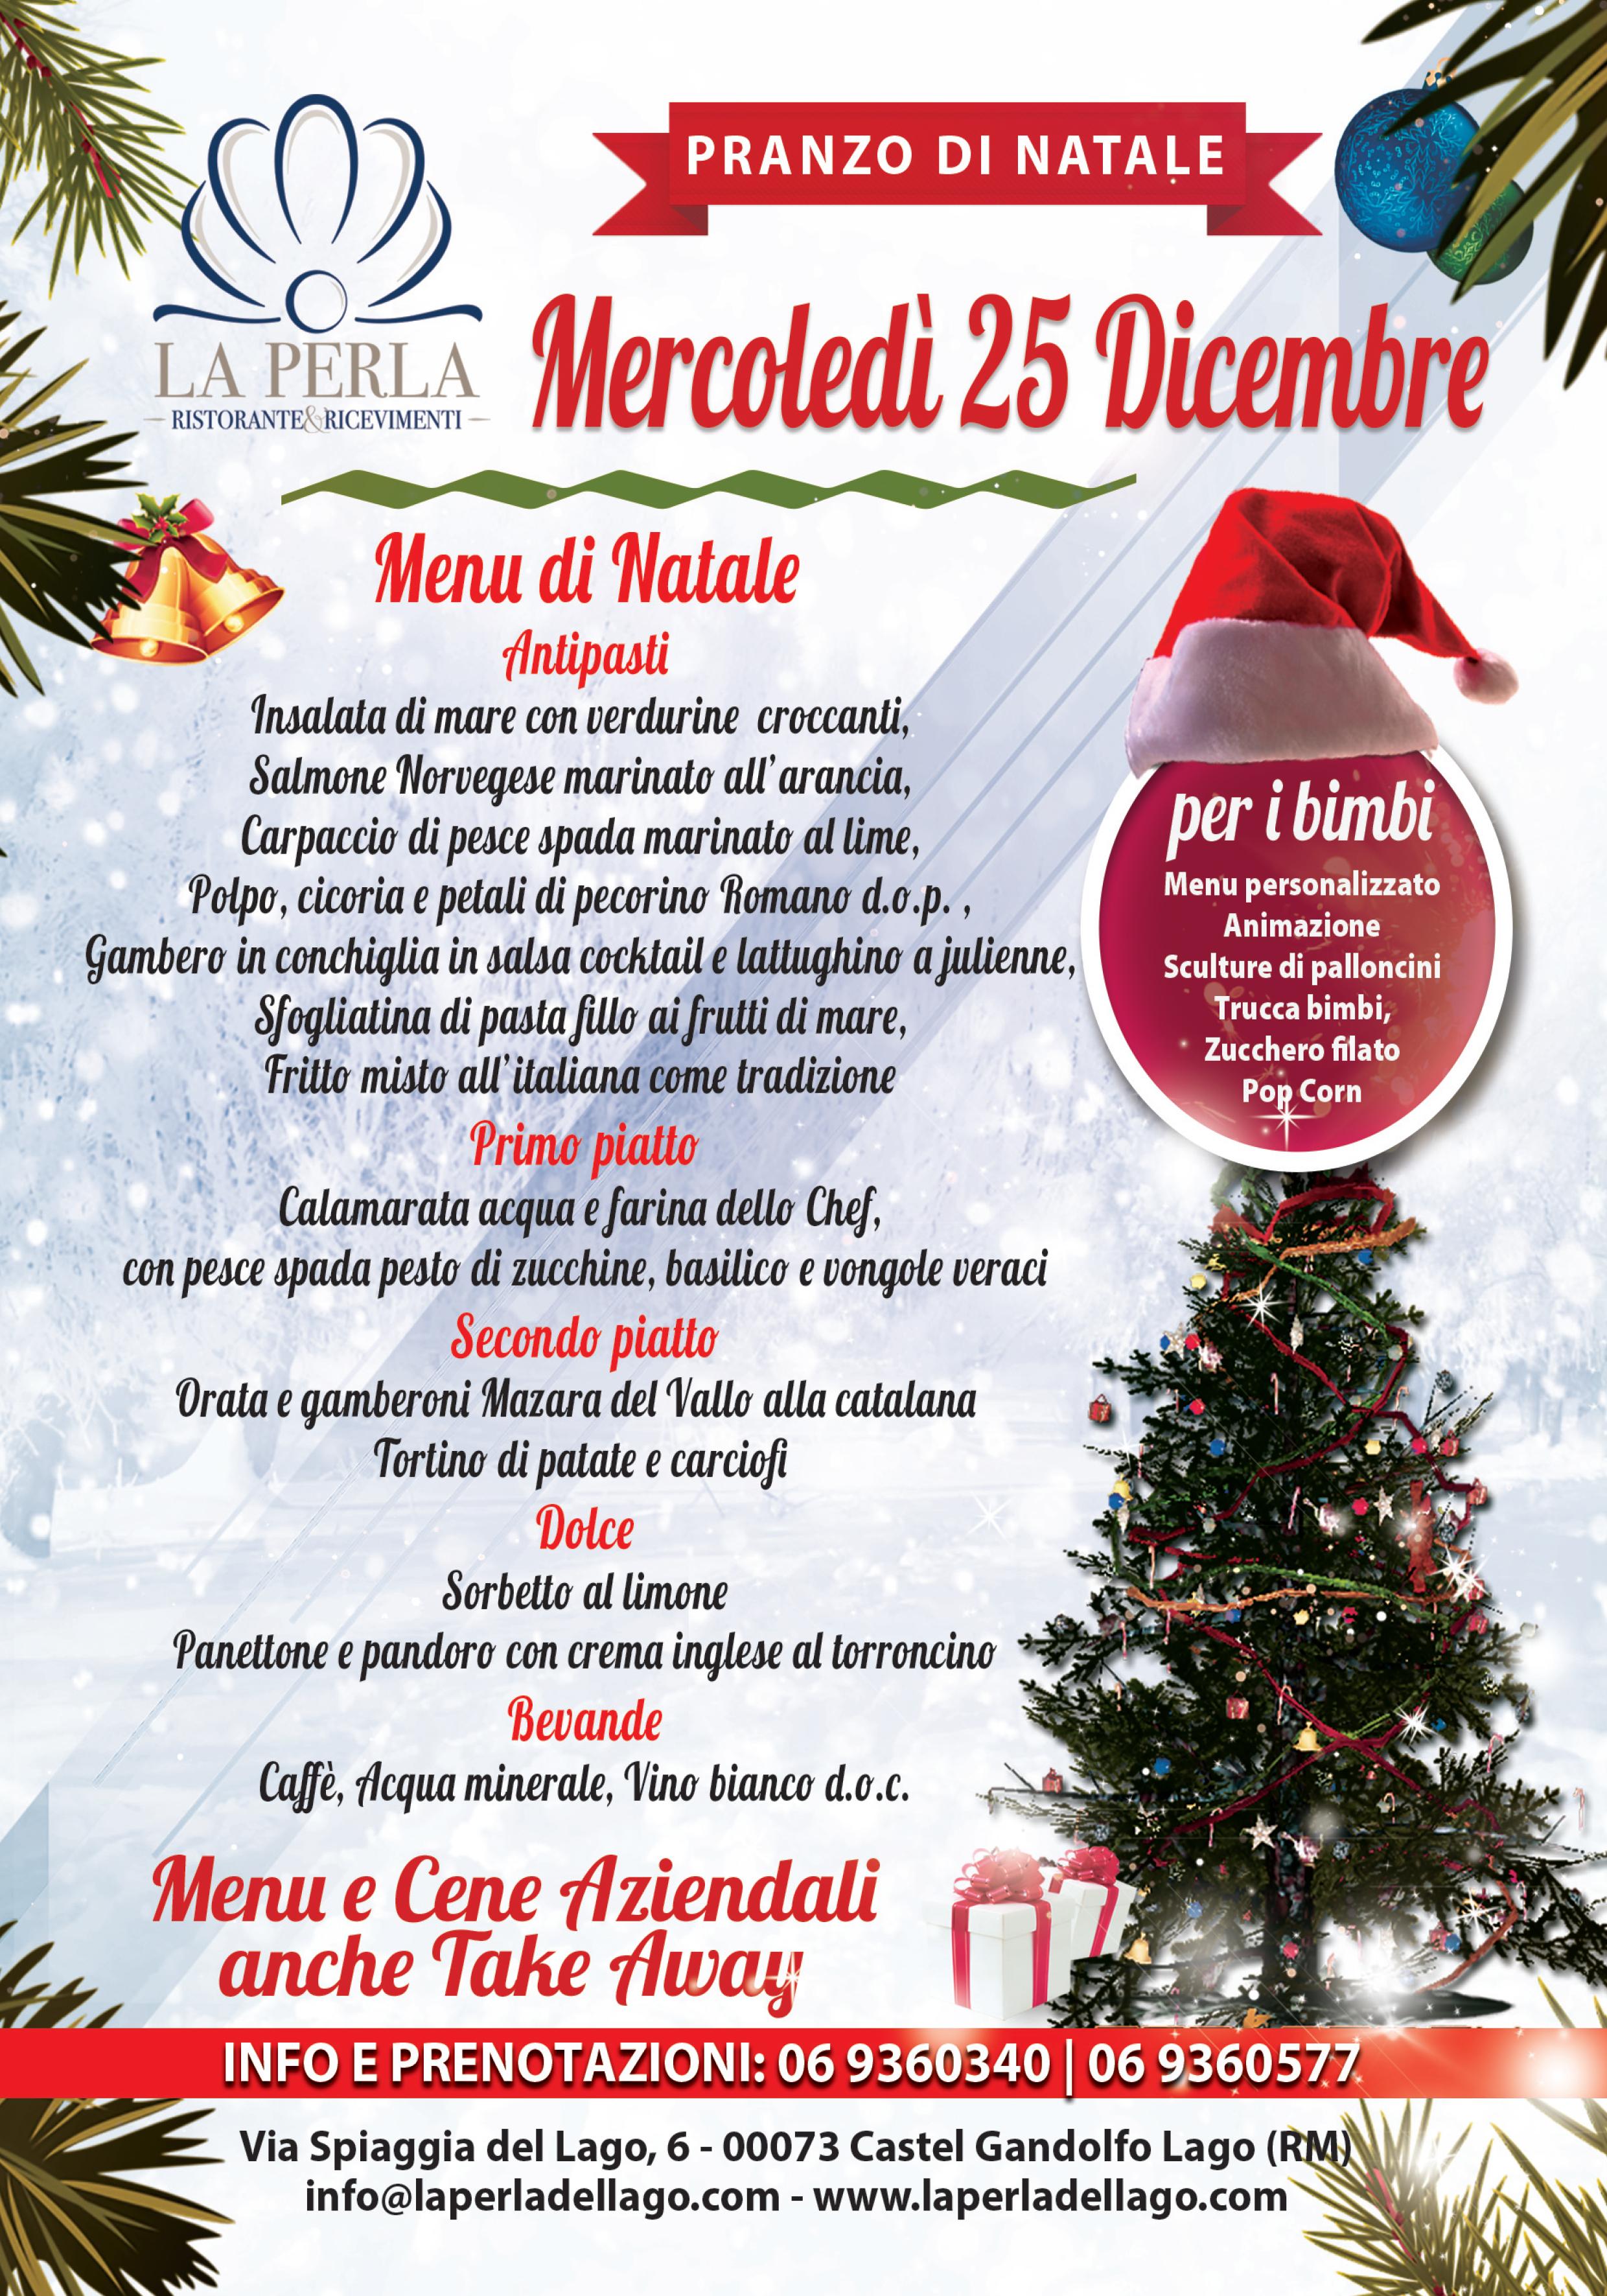 Menu di Natale 2019 ristorante la perla castel gandlfo